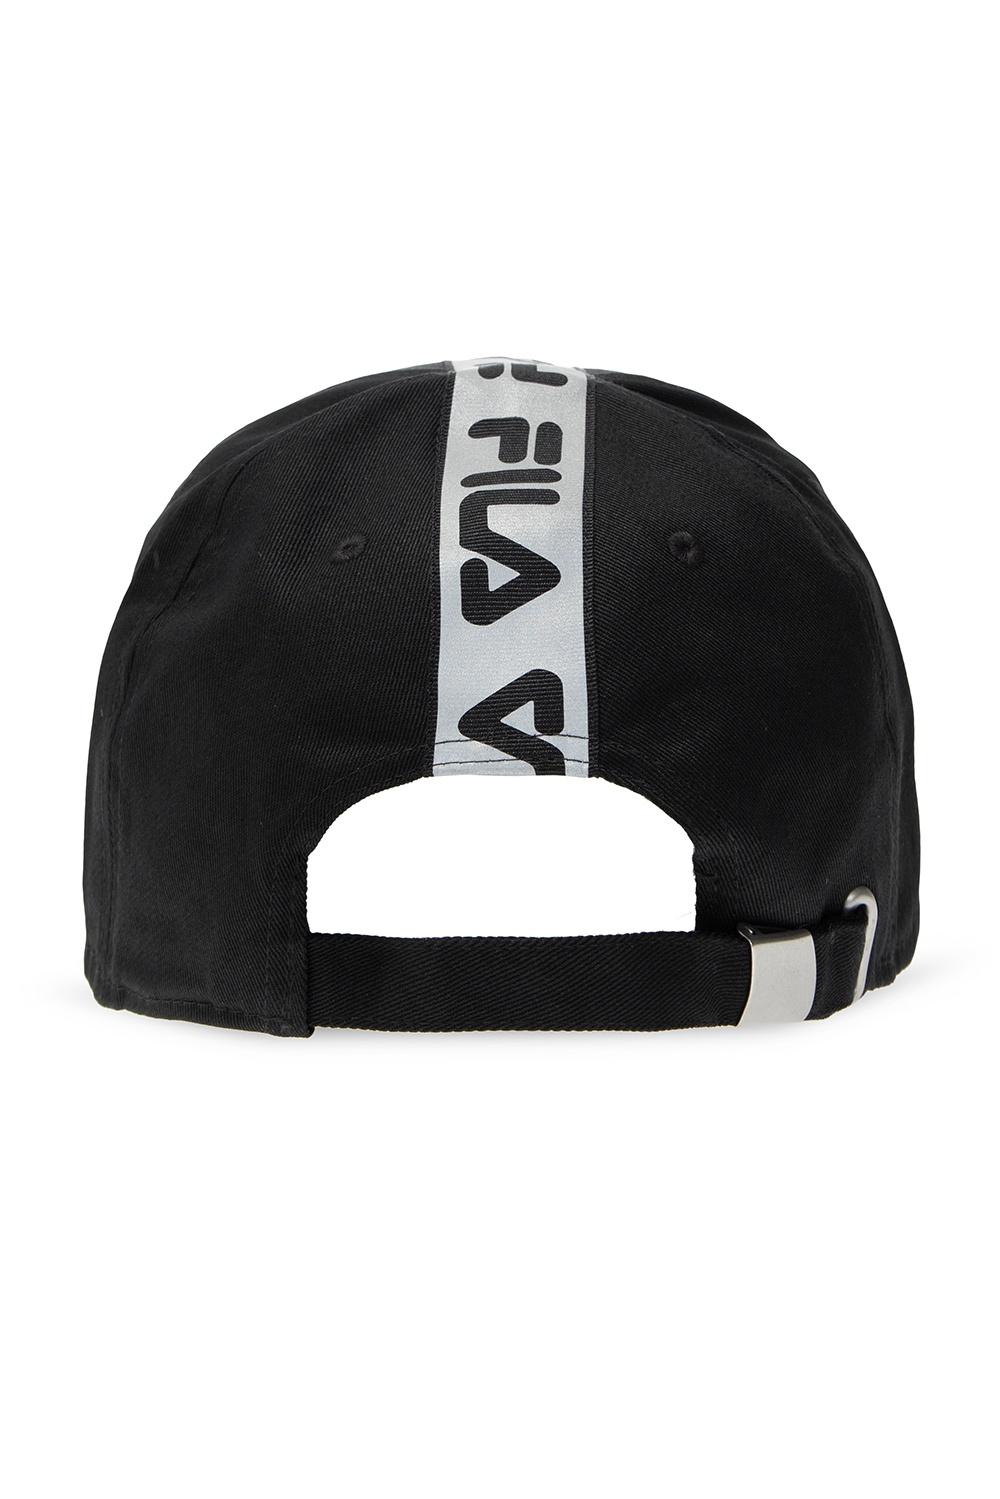 Fila Baseball cap with reflective logo